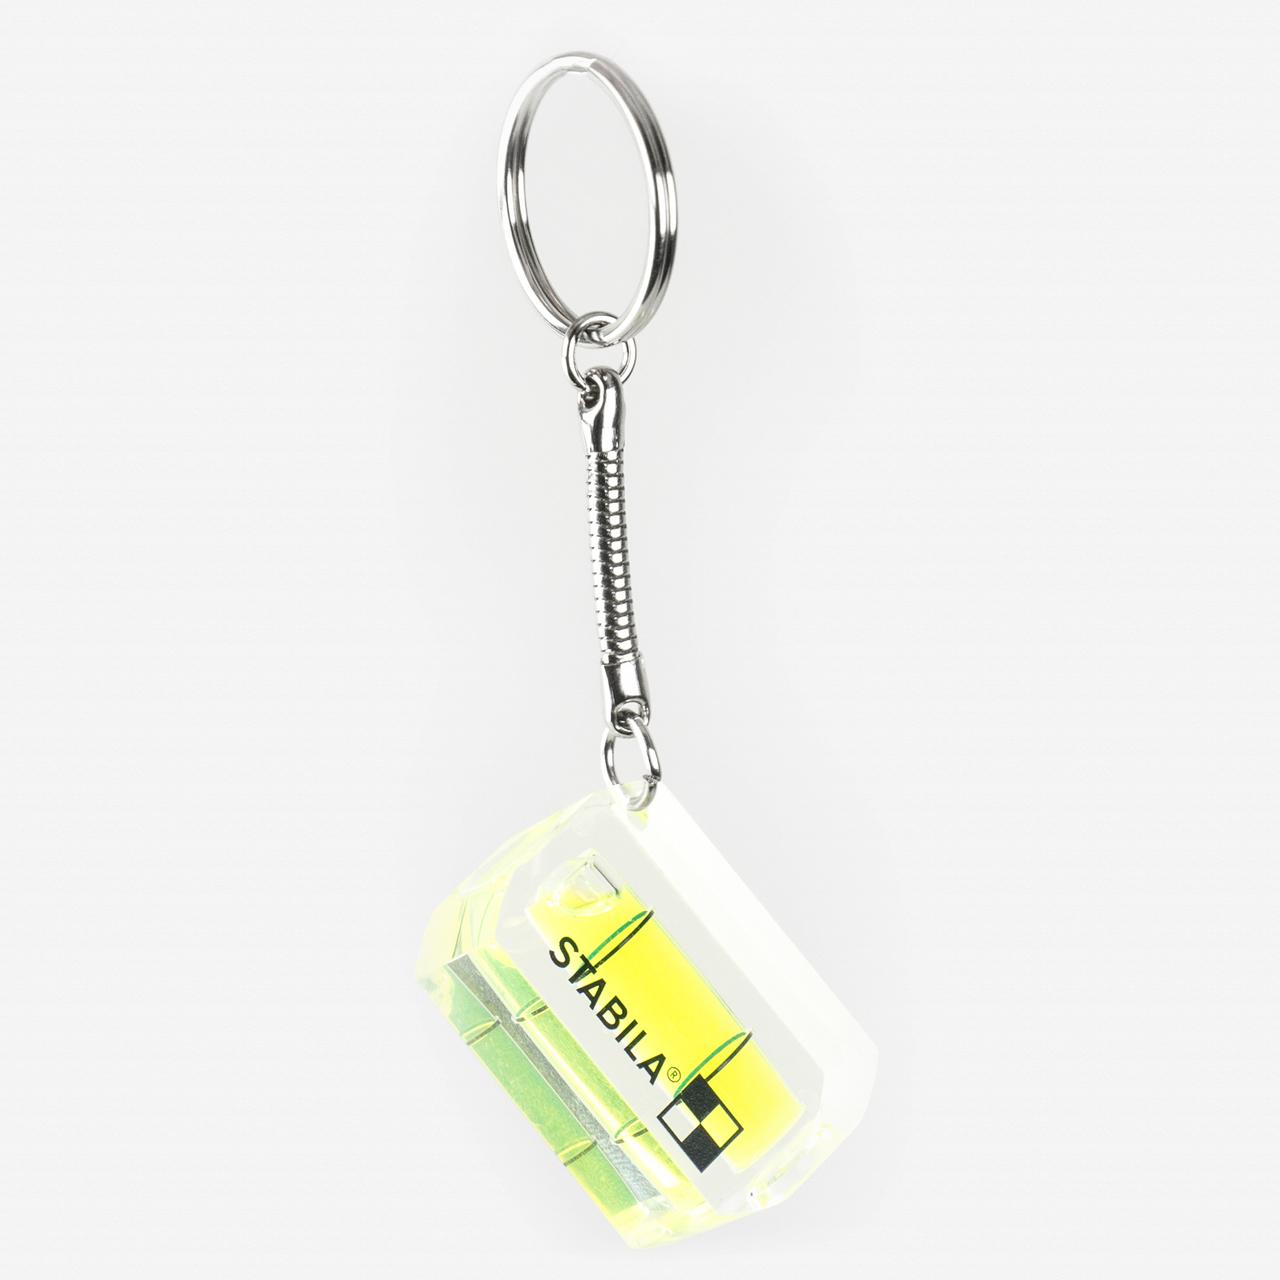 Stabila 76370 Acrylic Vial Key Chain - KC Tool